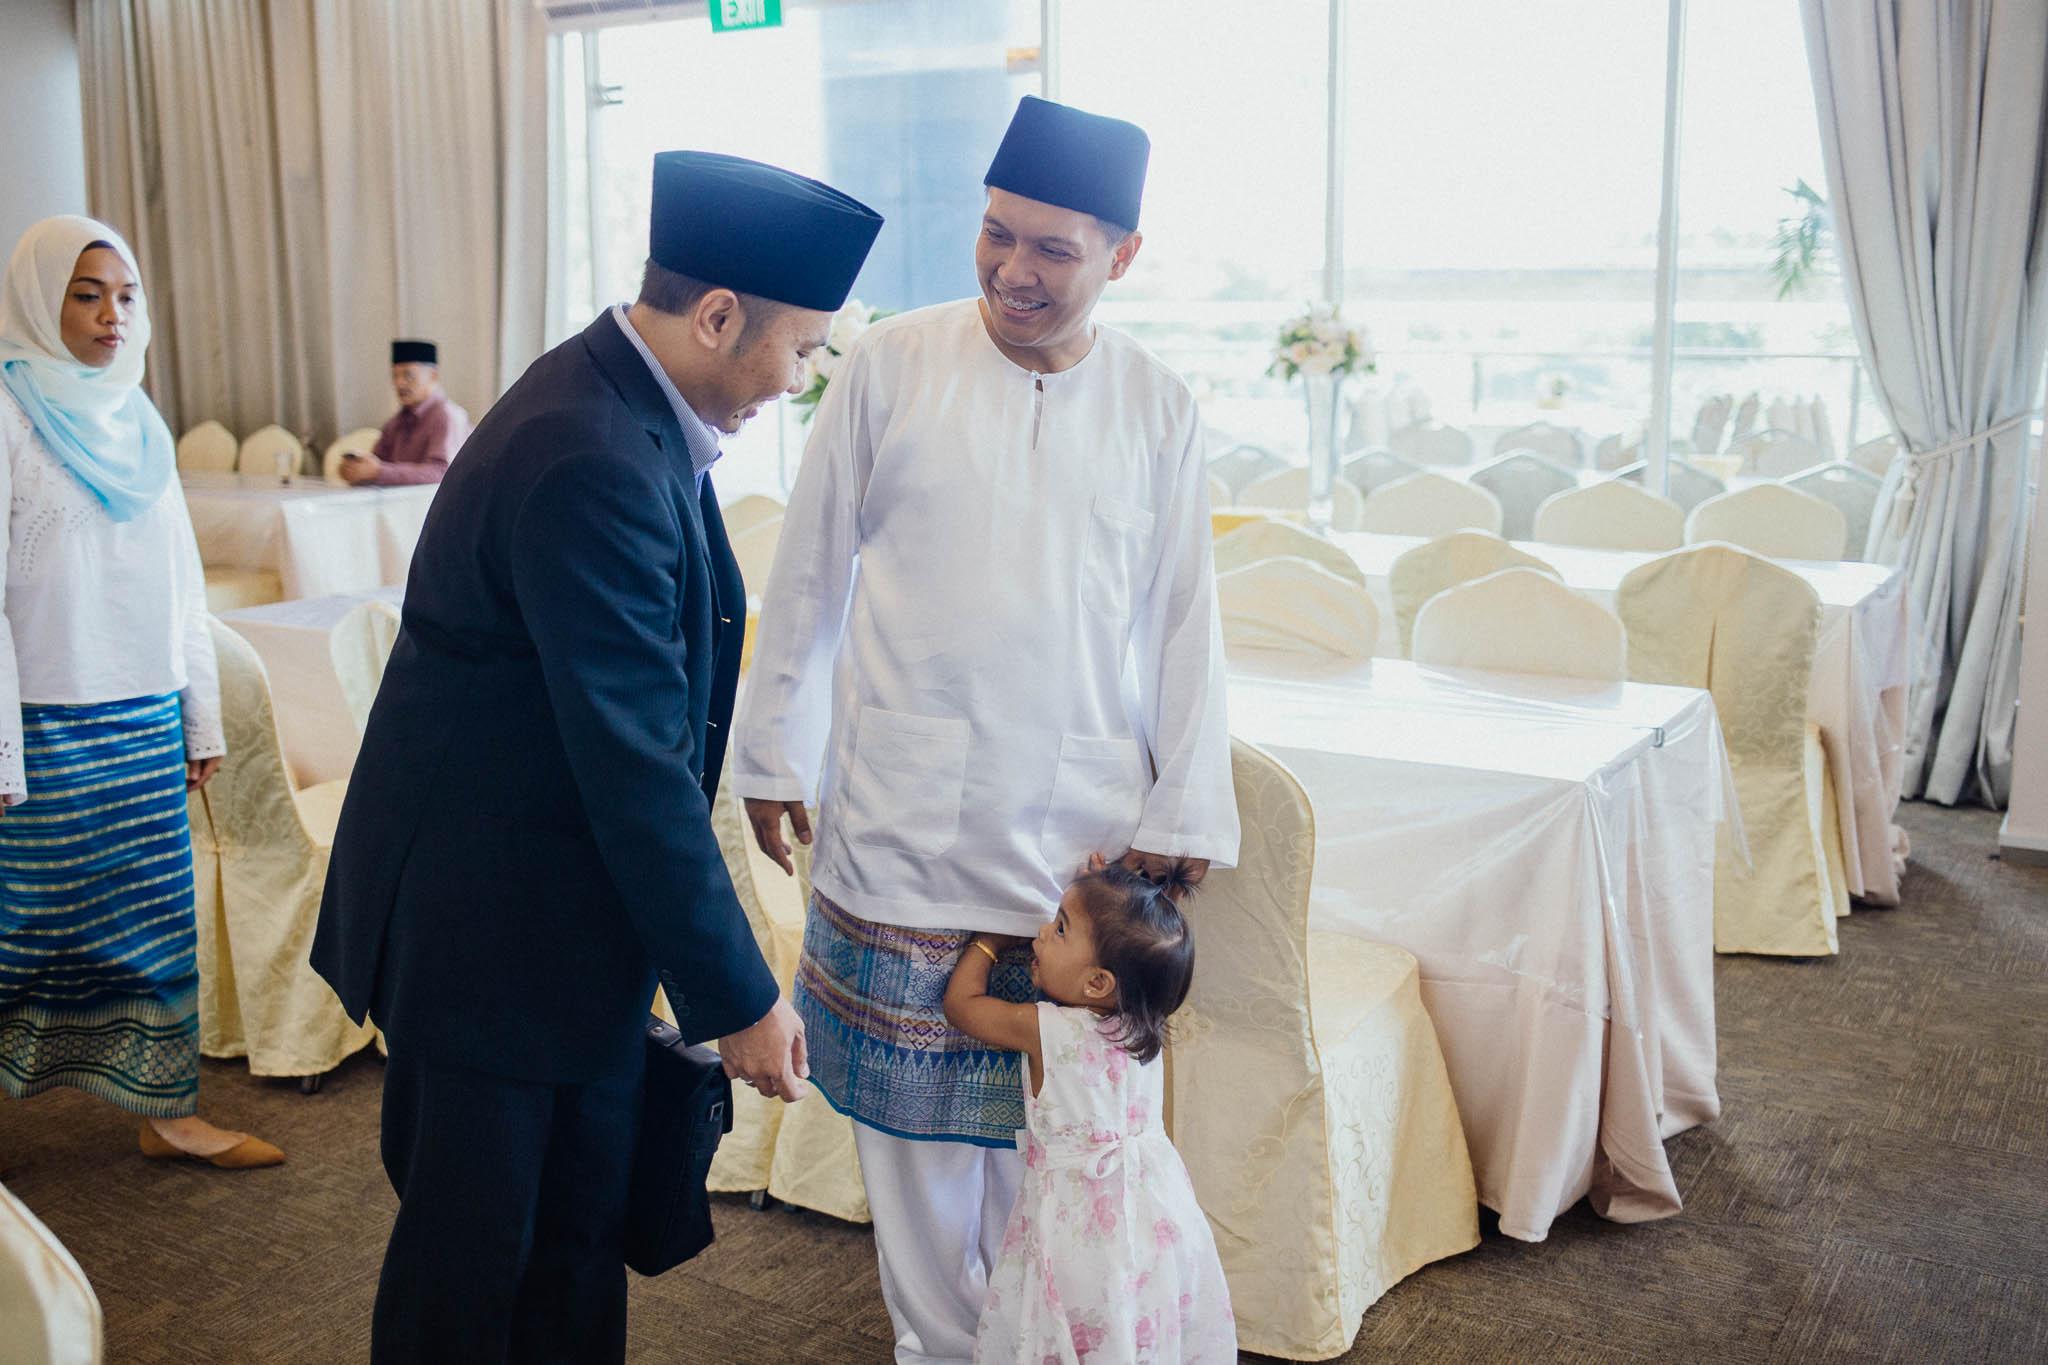 singapore-wedding-photographer-addafiq-nufail-012.jpg